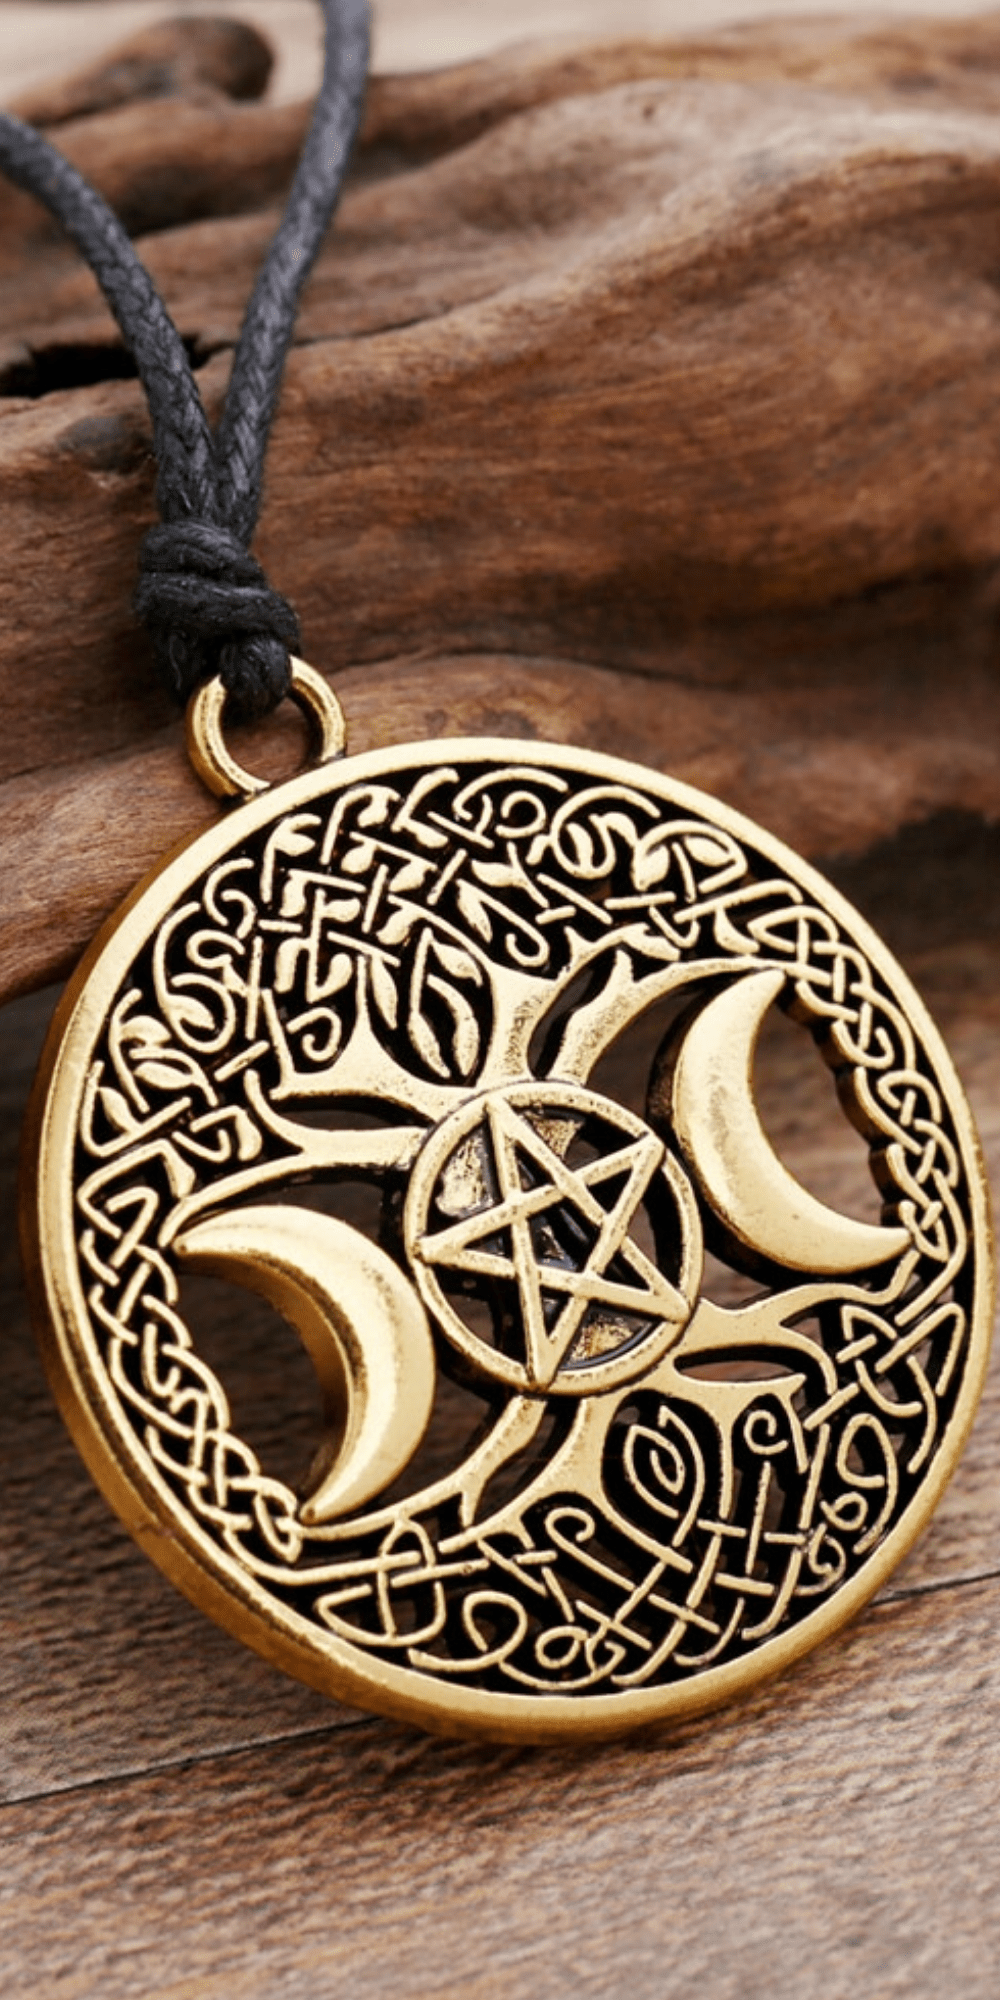 Celtic Mother Goddess pendant celtic knot tree of life pagan handmade